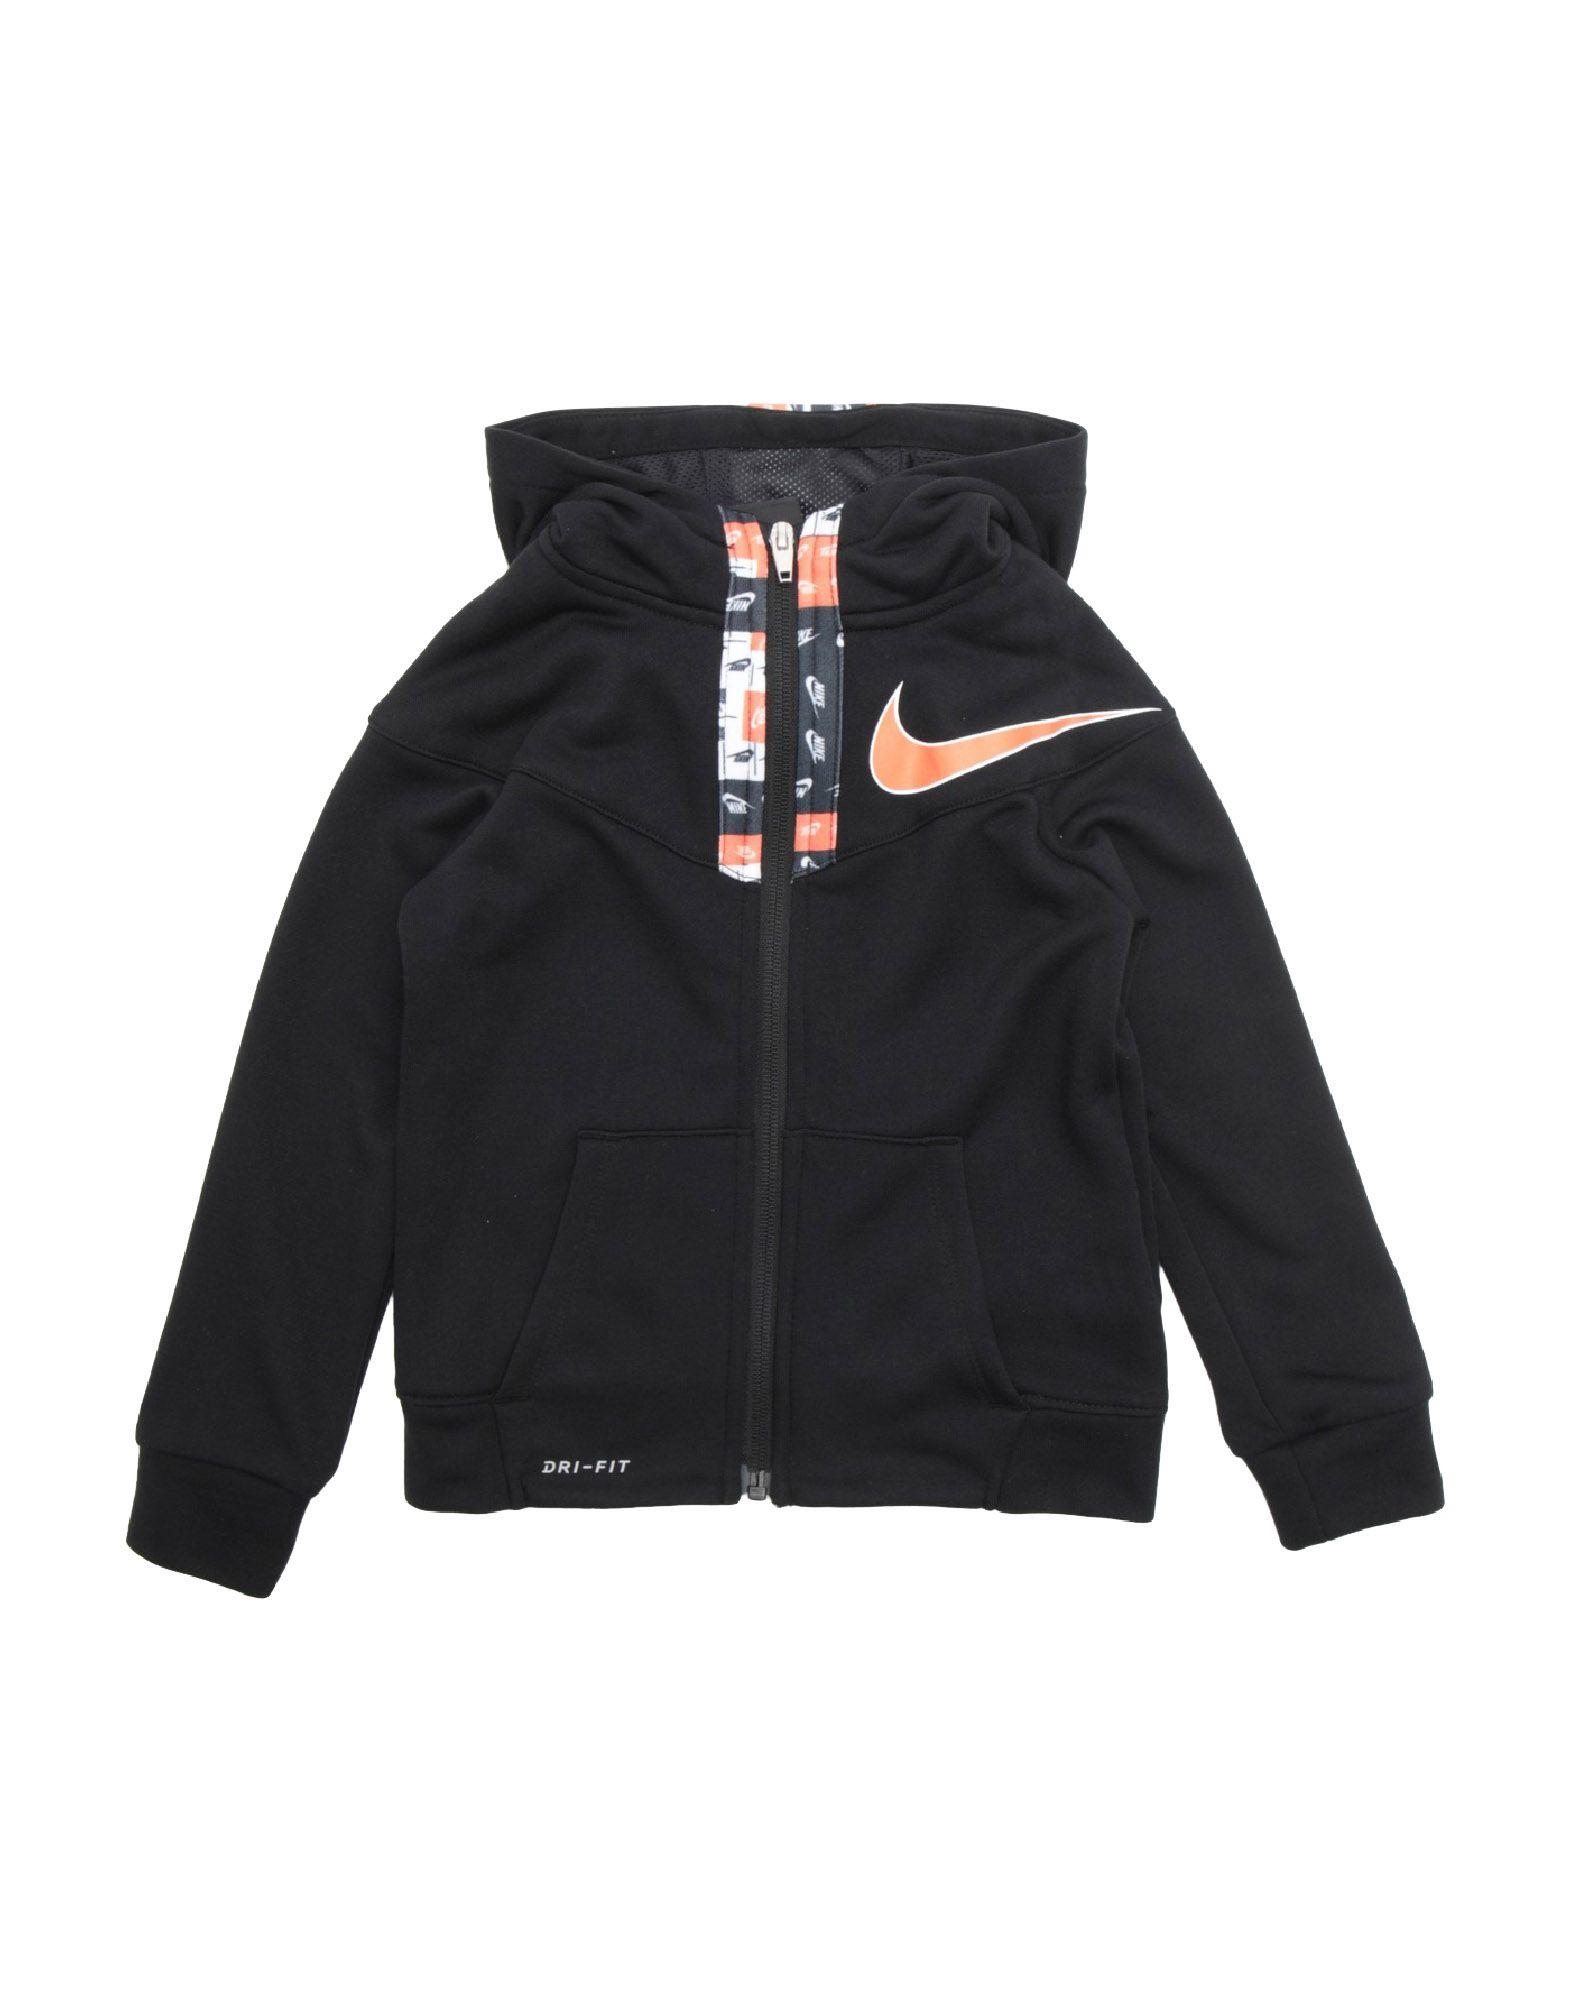 sweatshirt fleece, logo, breathable fabric, solid color, hooded collar, long sleeves, front closure,